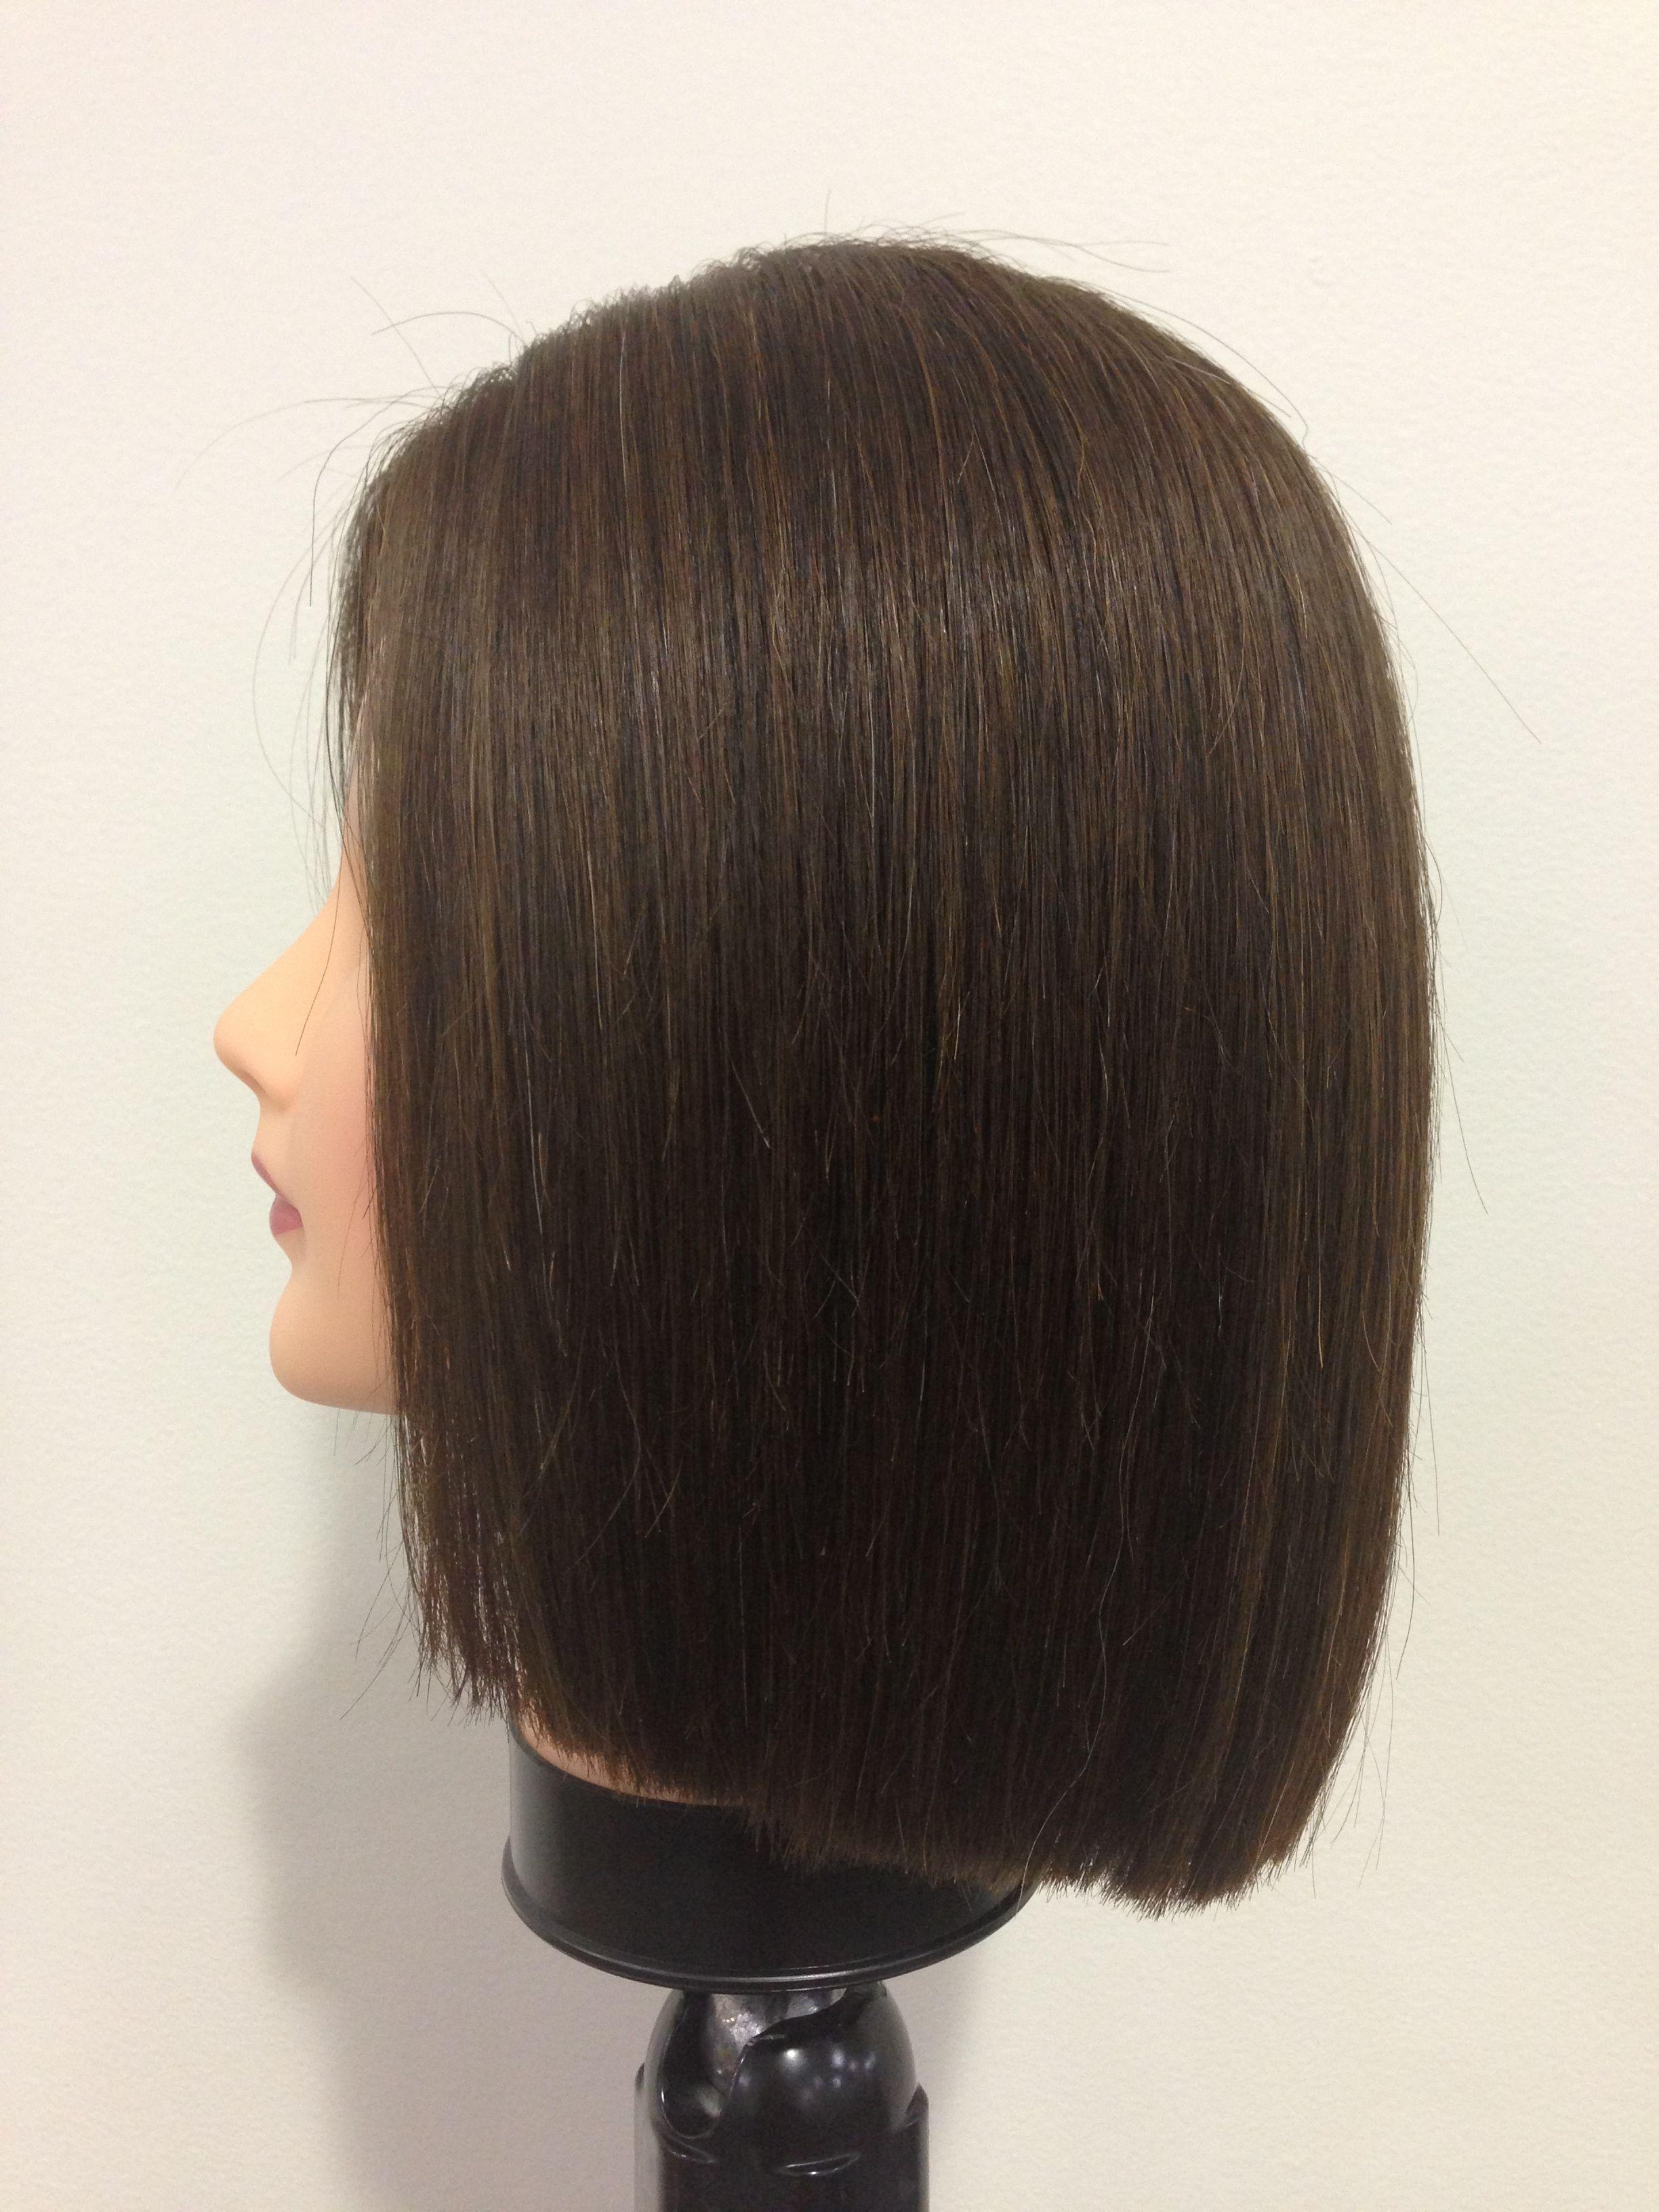 Round One Length Angela Raderchak One Length Haircuts Haircut Types One Length Hair